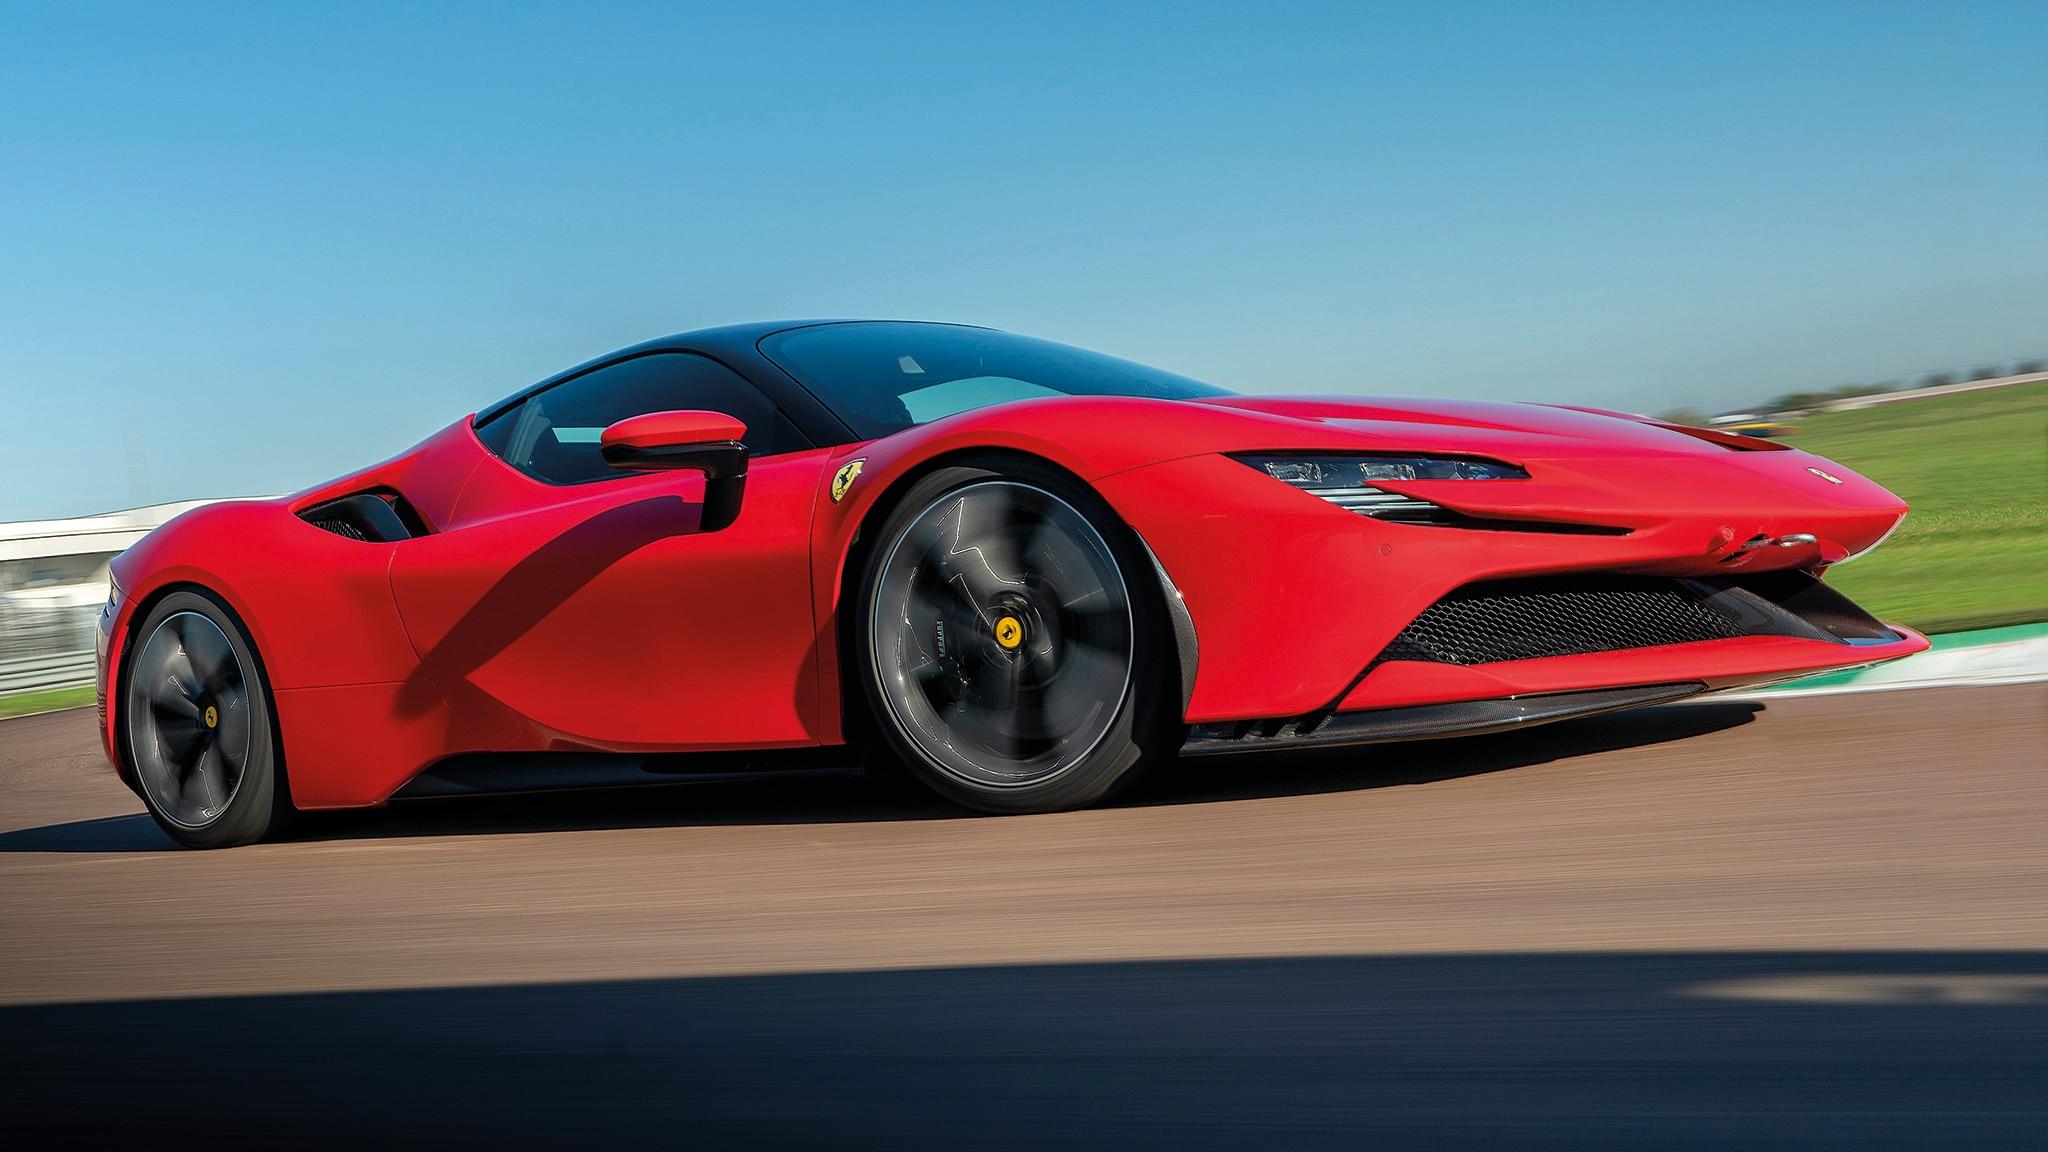 SF90 Stradale @Ferrari SpA 2